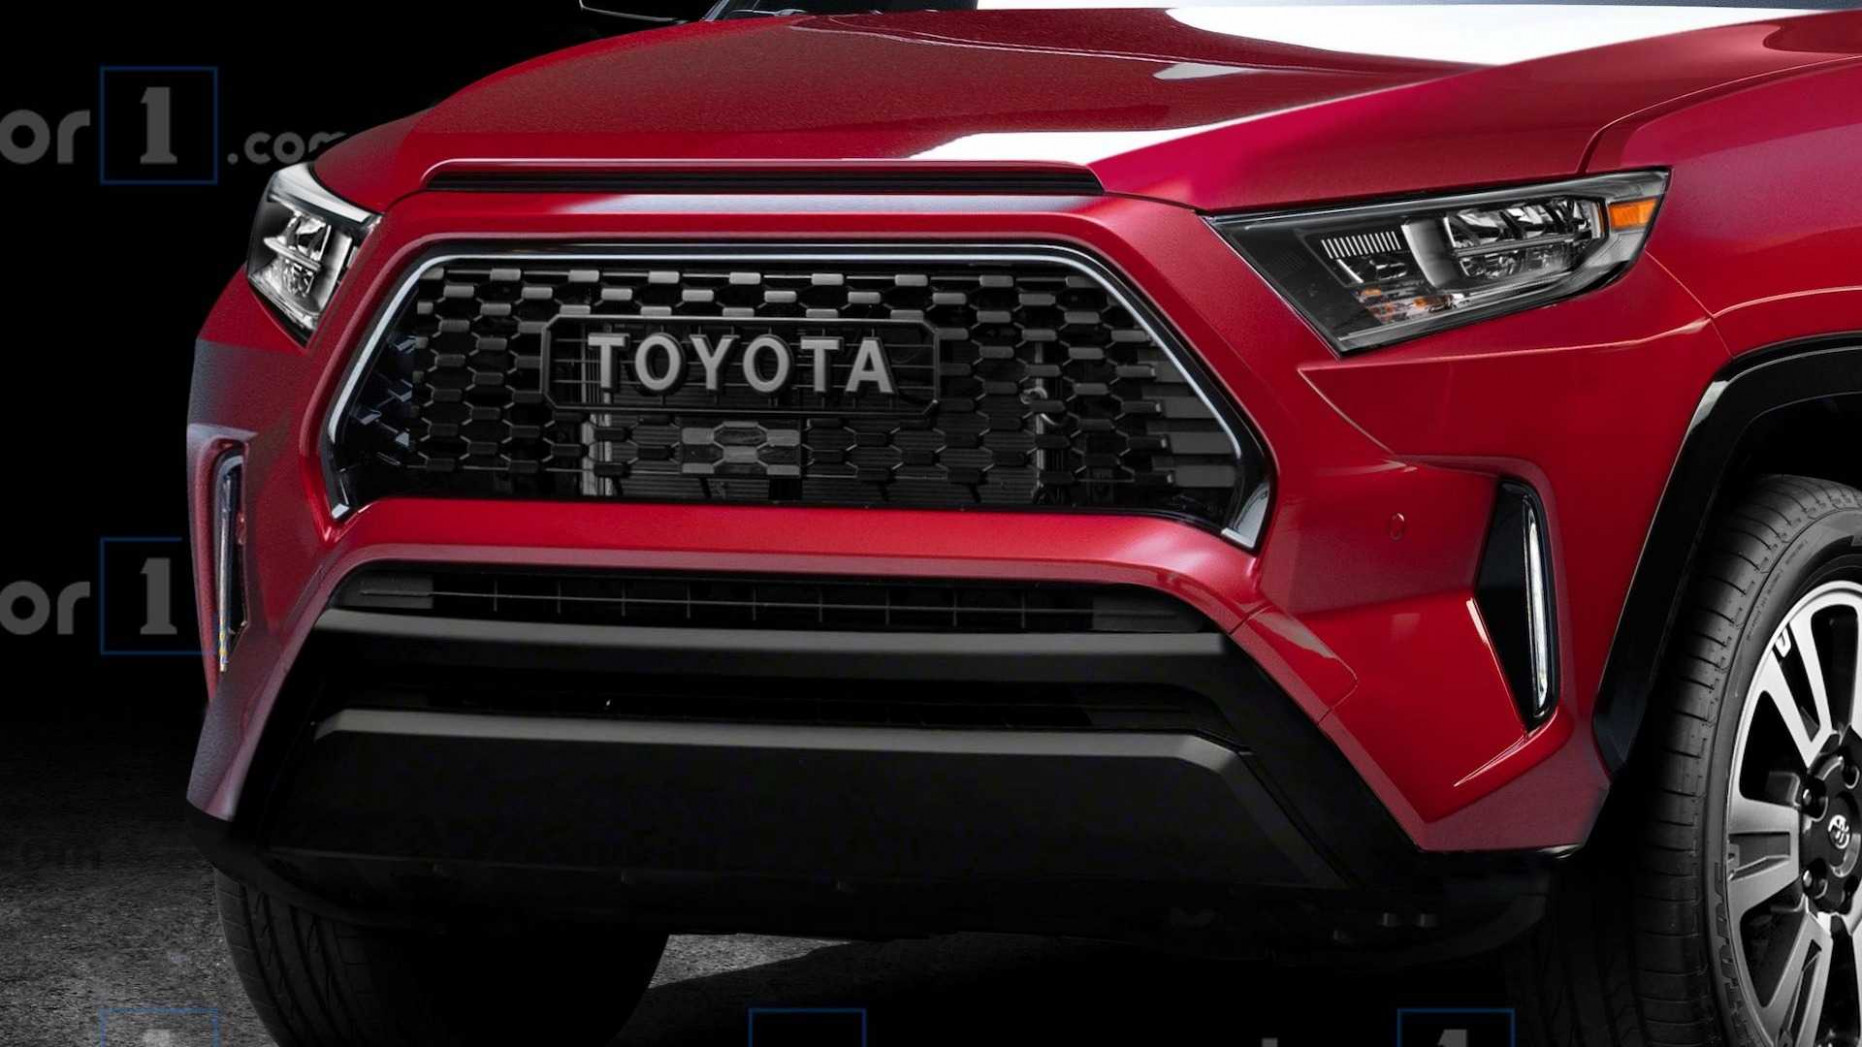 Pricing 2022 Toyota Tundra